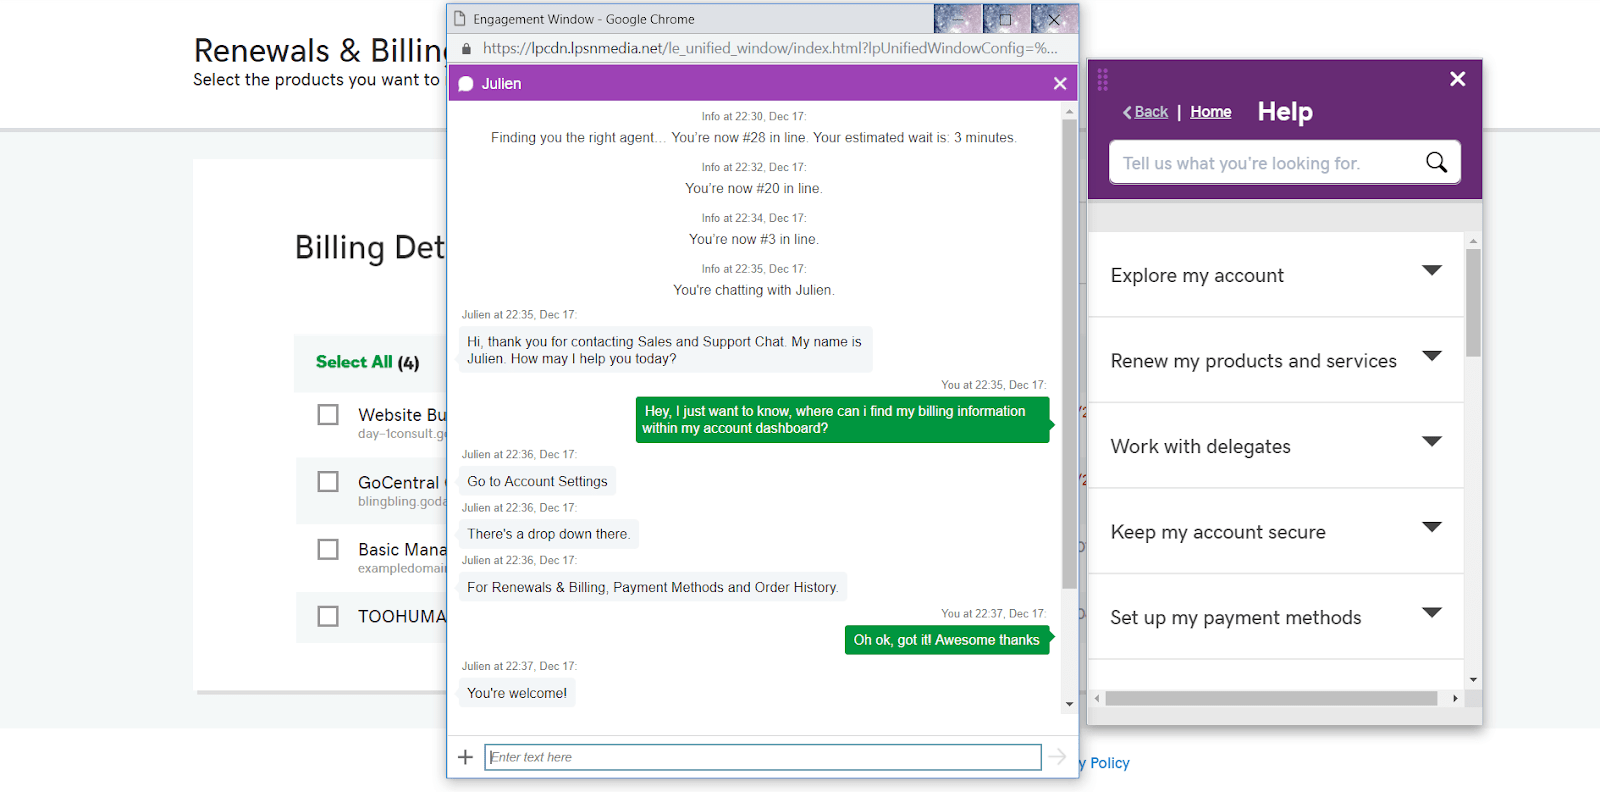 [GoDaddy] - [support chat]